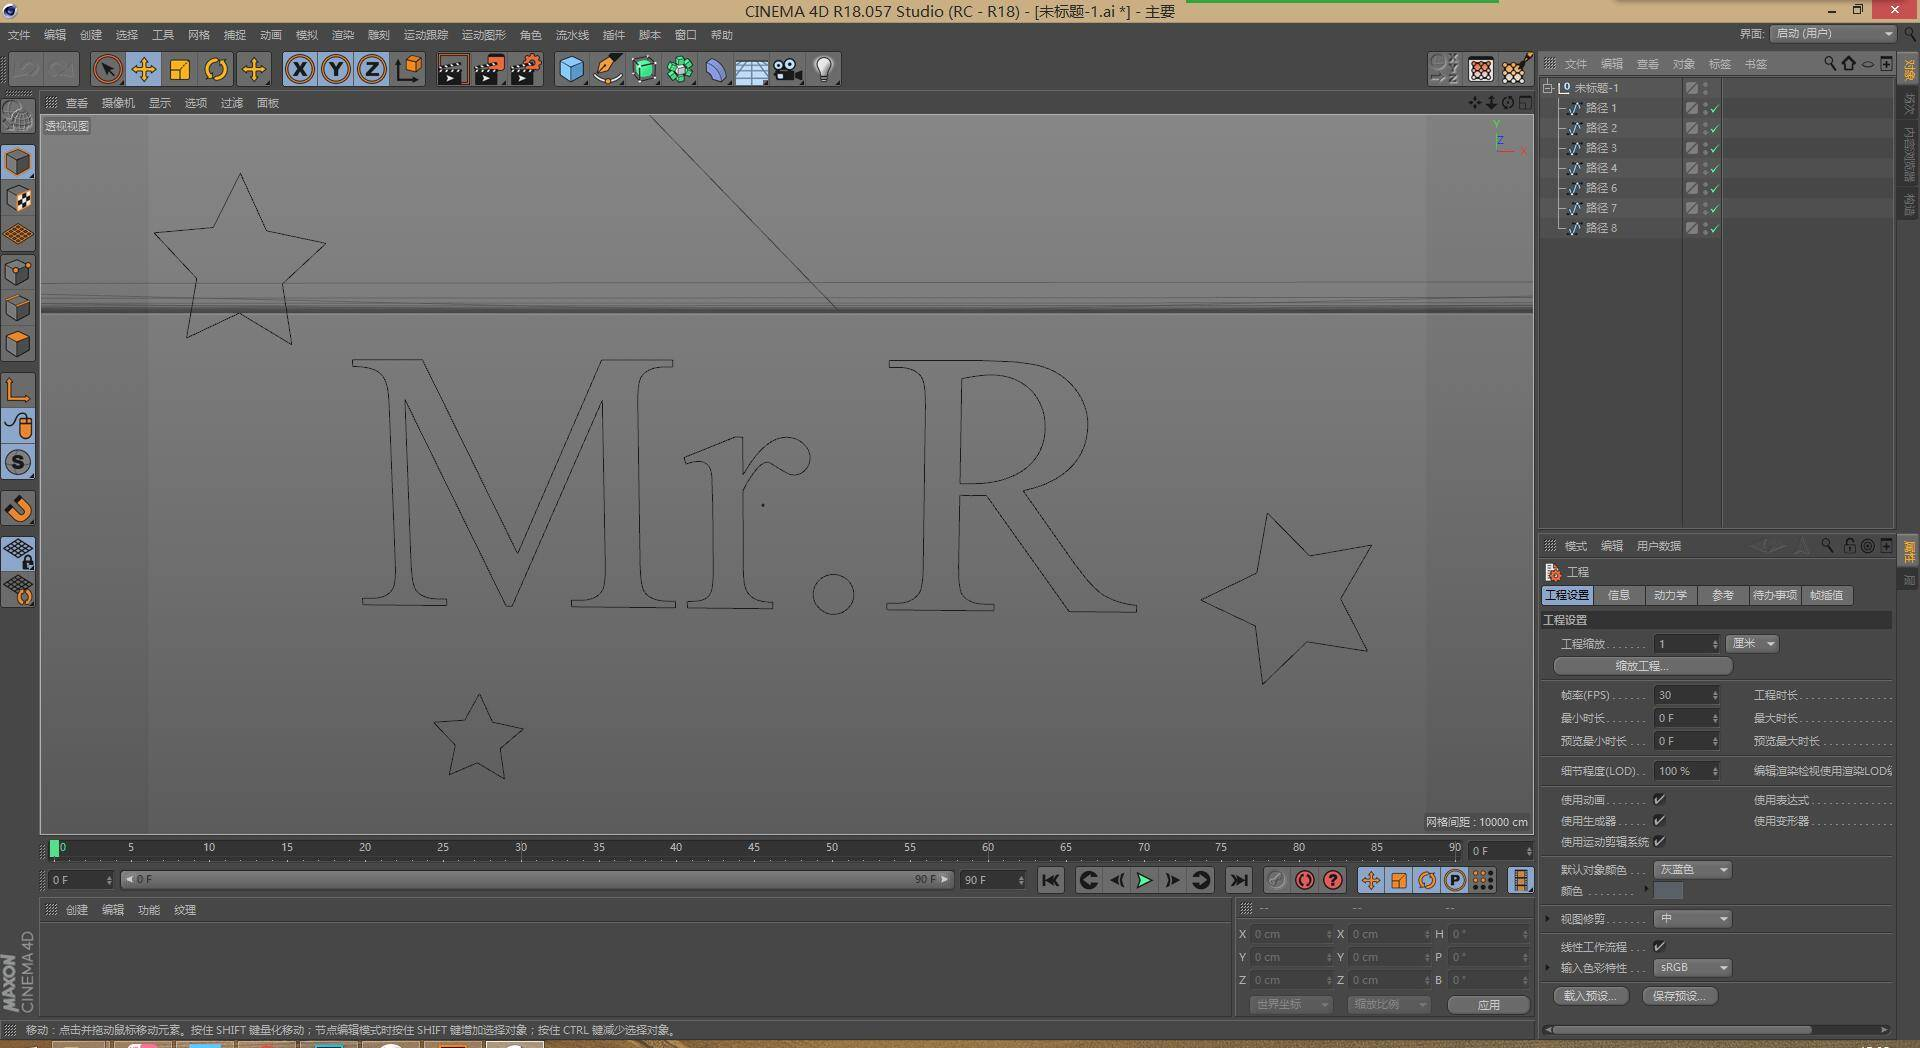 CINEMA 4D入门 (50):使用Adobe Illustrator 结合 C4D 设计 - R站|学习使我快乐! - 7